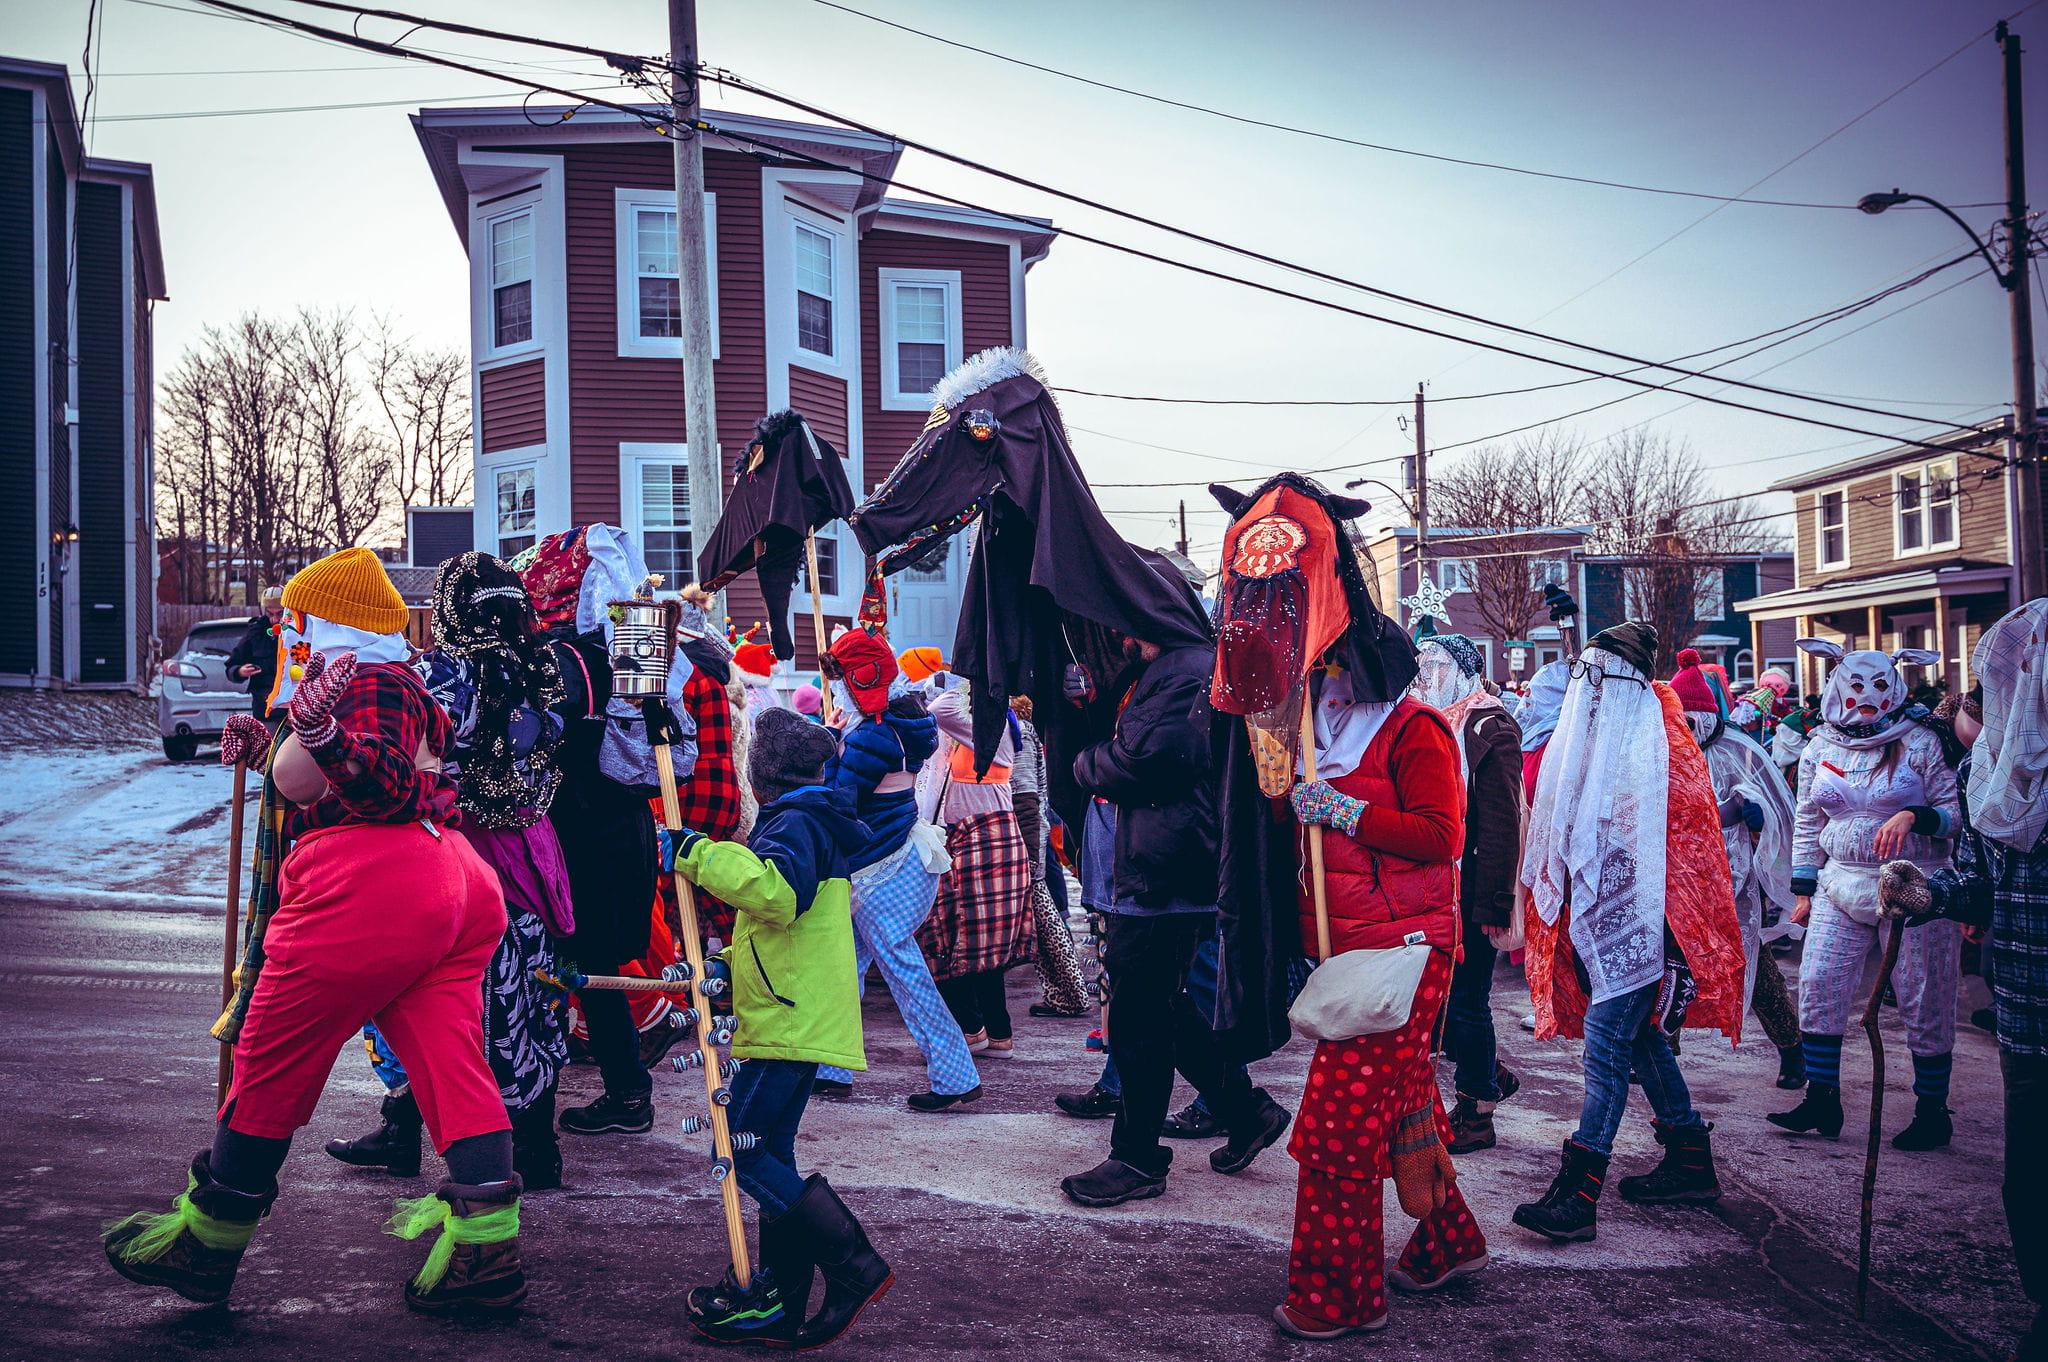 Mummer's Parade in St. John's